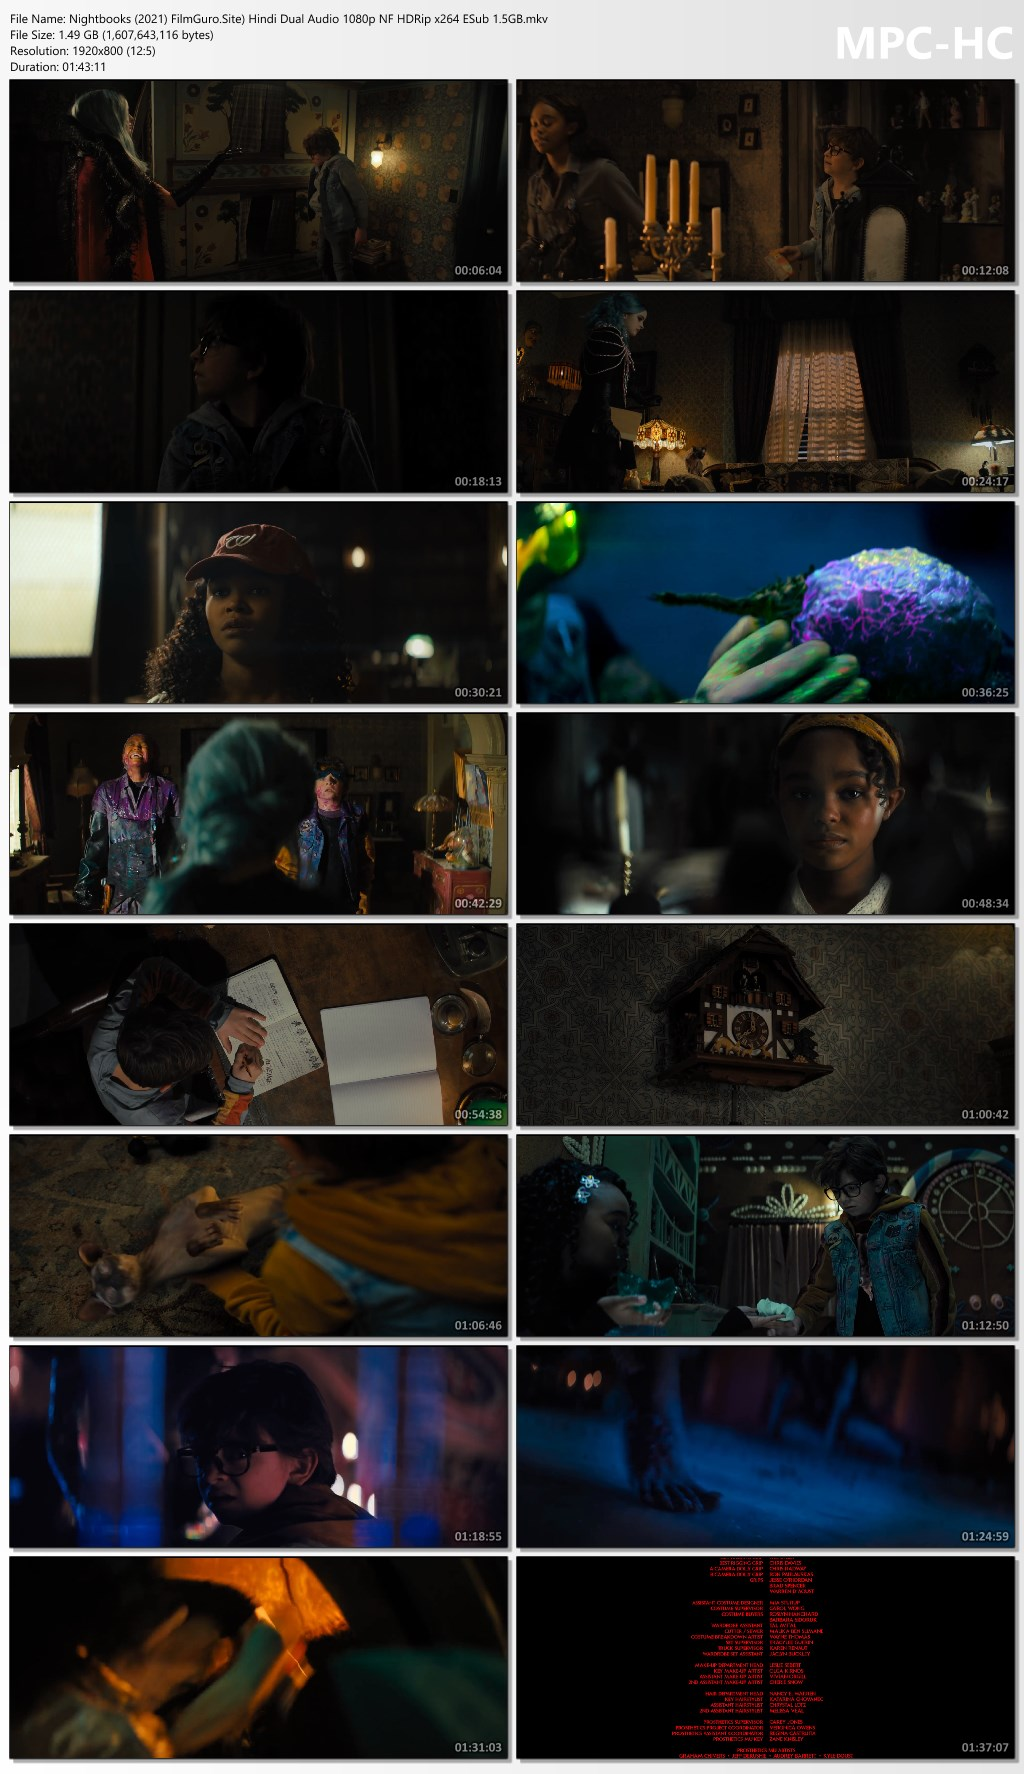 Nightbooks-2021-Film-Guro-Site-Hindi-Dual-Audio-1080p-NF-HDRip-x264-ESub-1-5-GB-mkv-thumbs